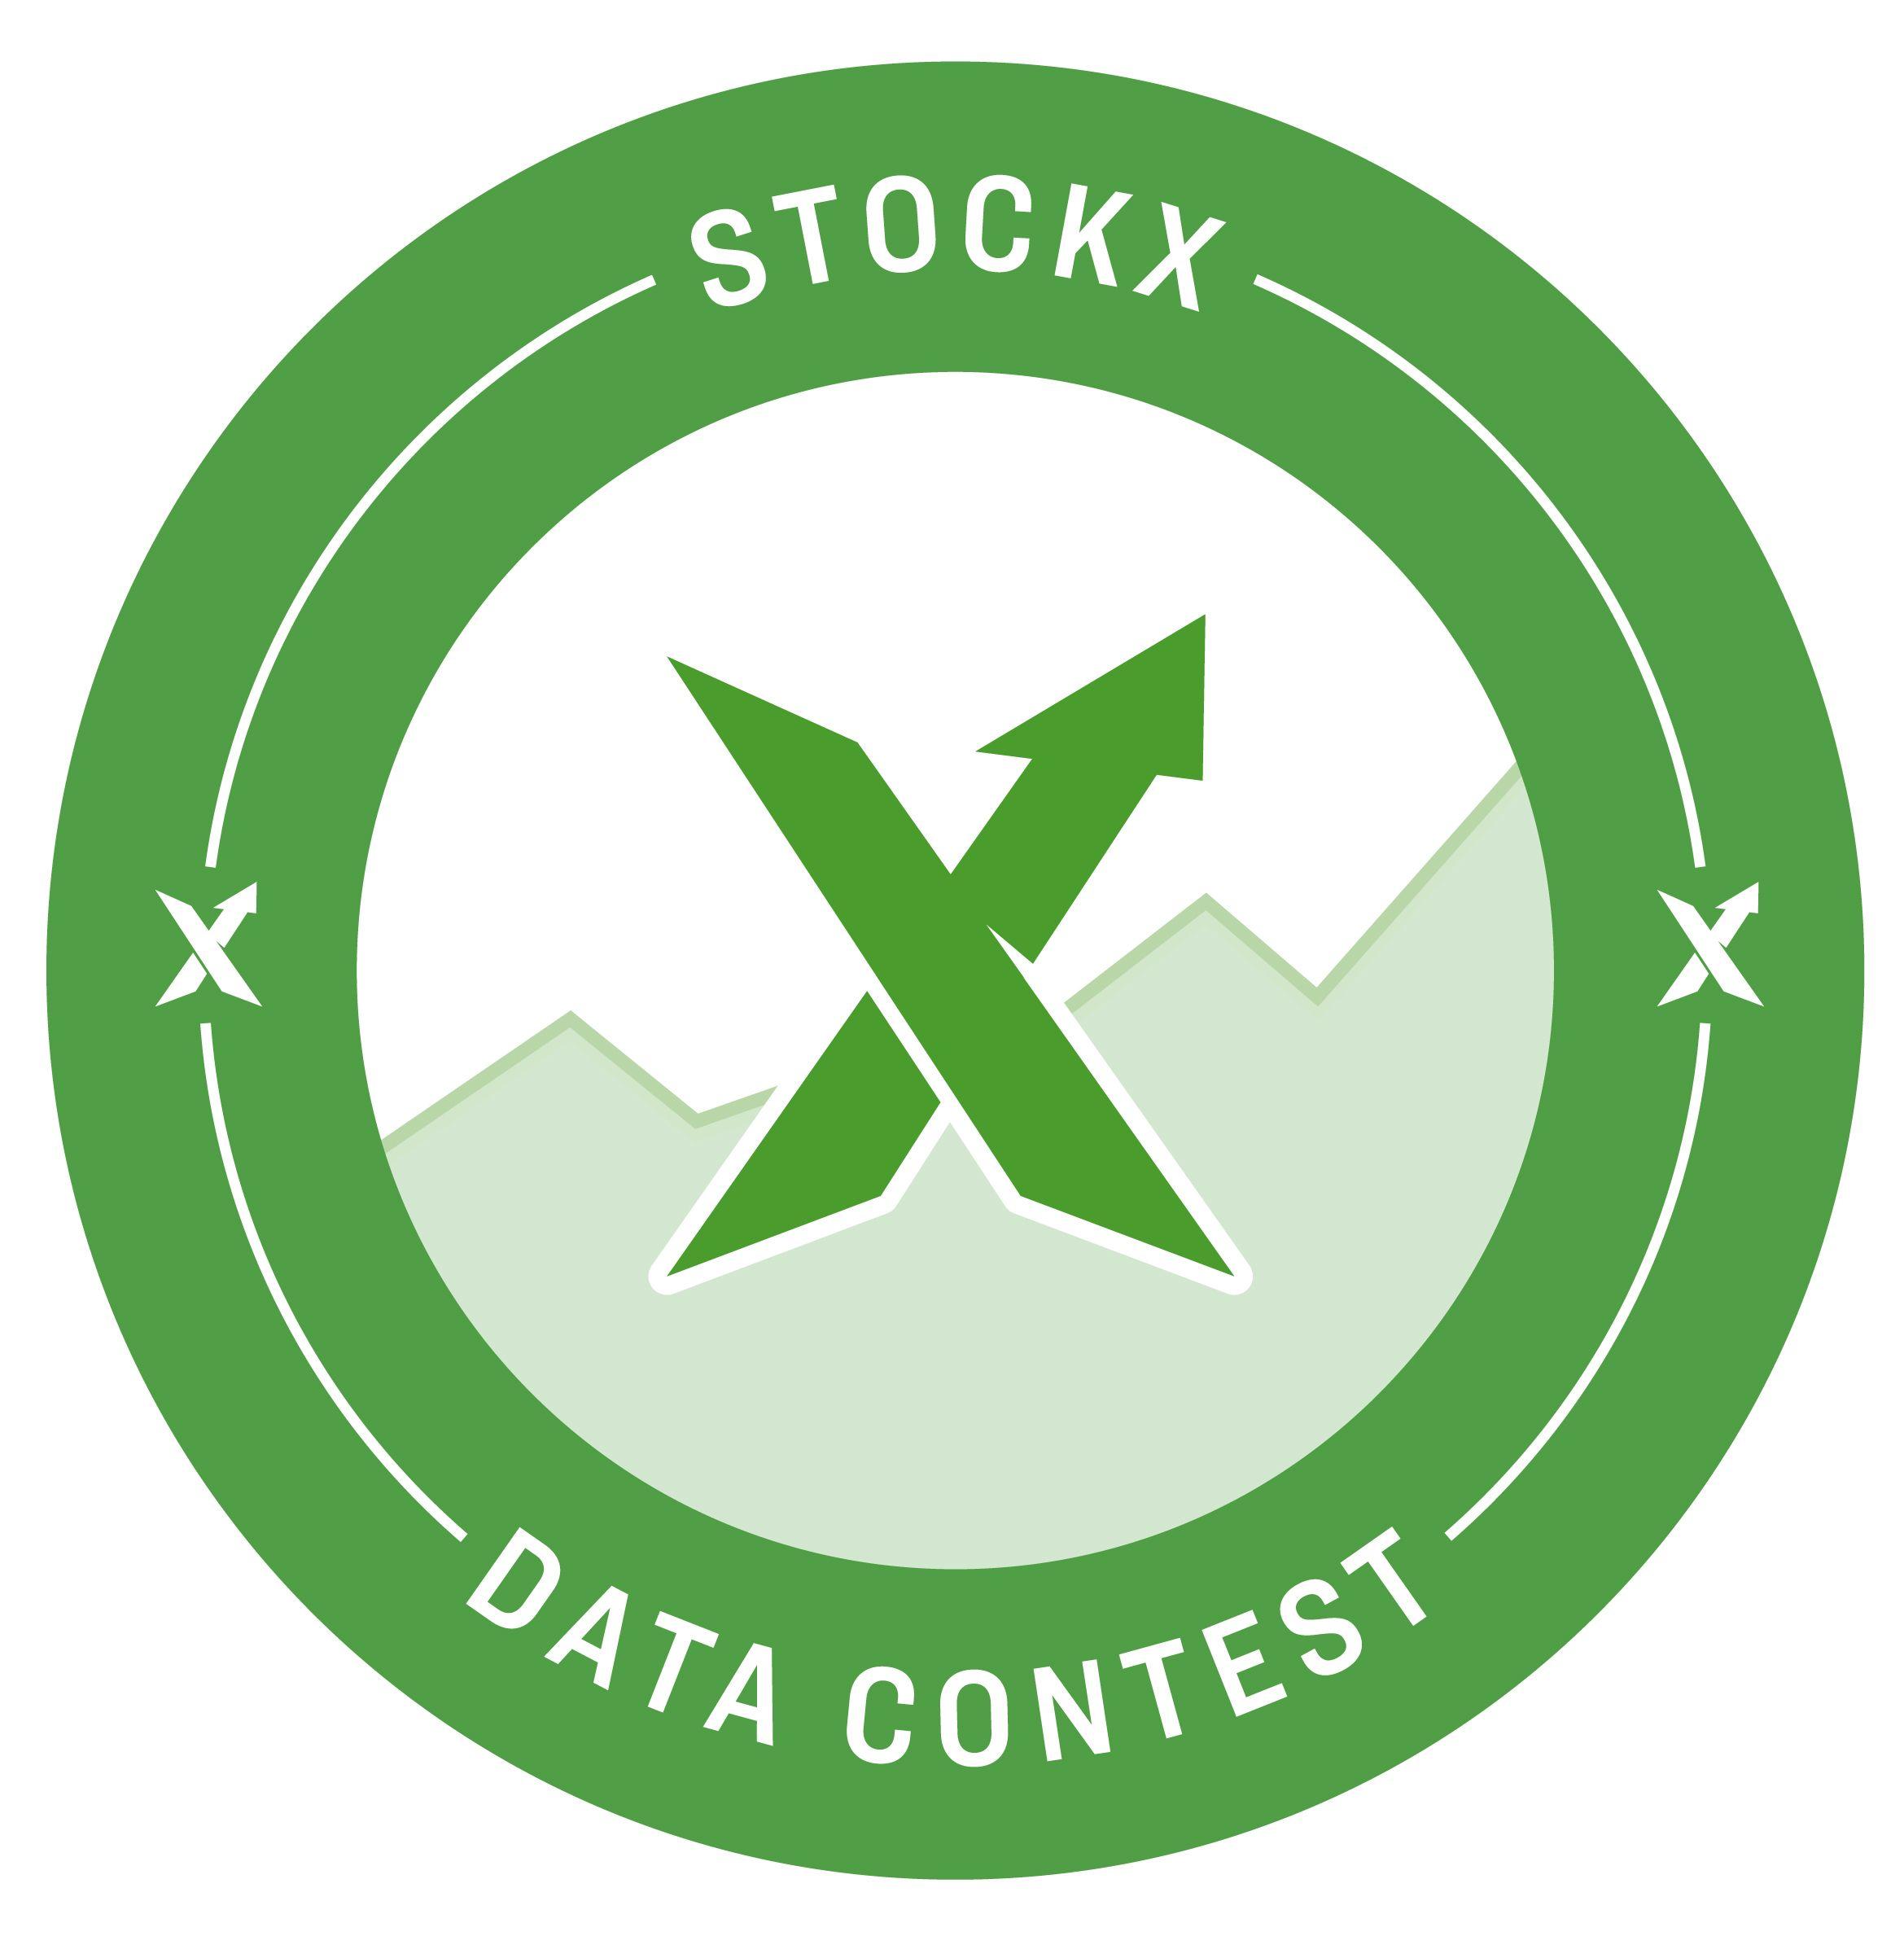 Stockx promo code 2019 | Coding. Promo codes. Newyear